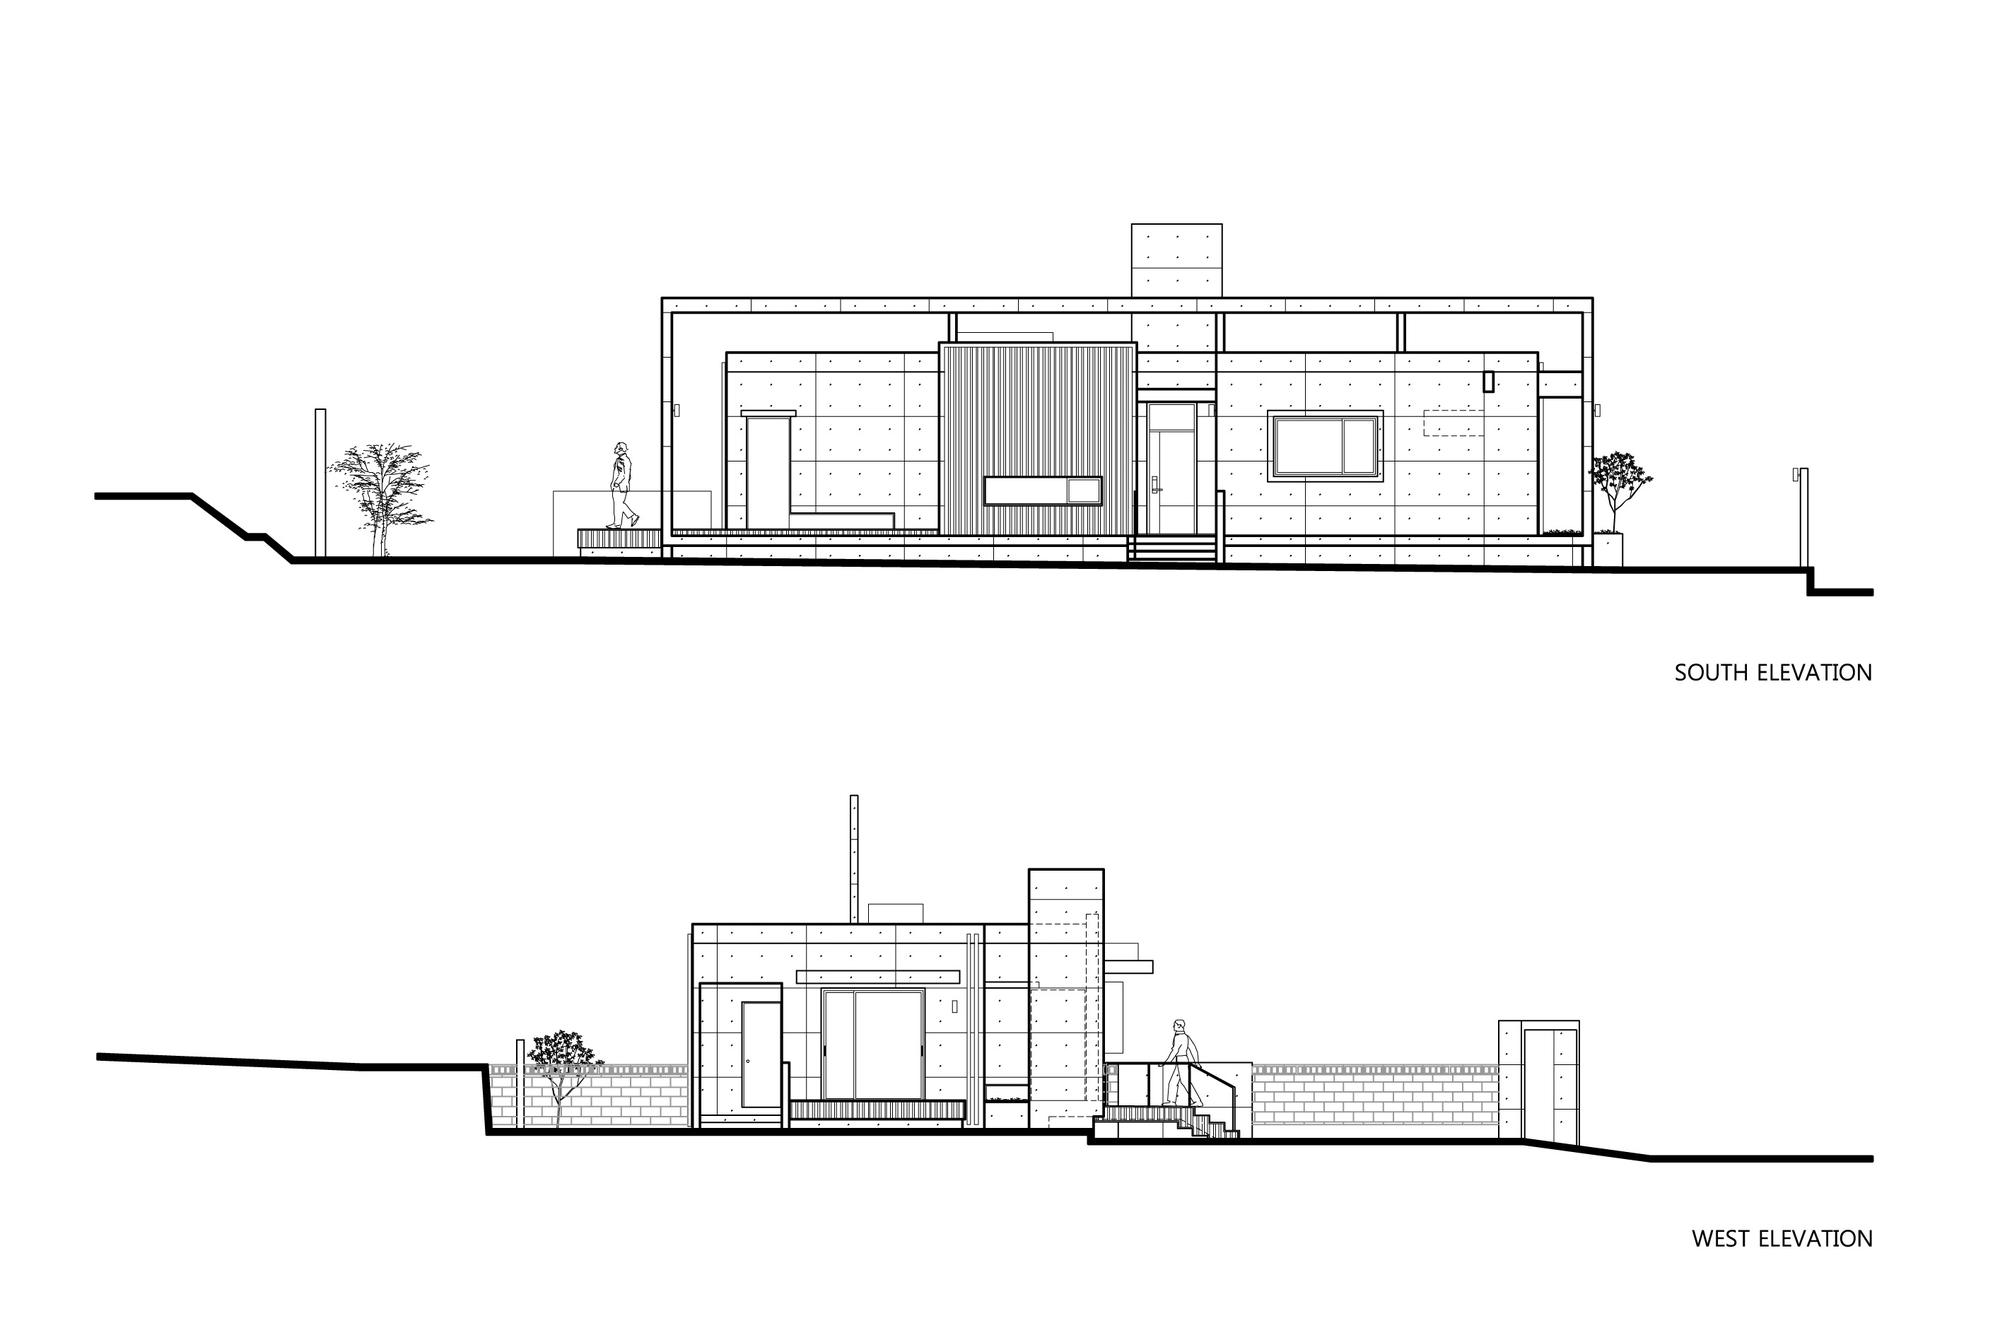 52f1a61ce8e44e0b6d0000d9_mun-jeong-heon-a-m-architects_elevation